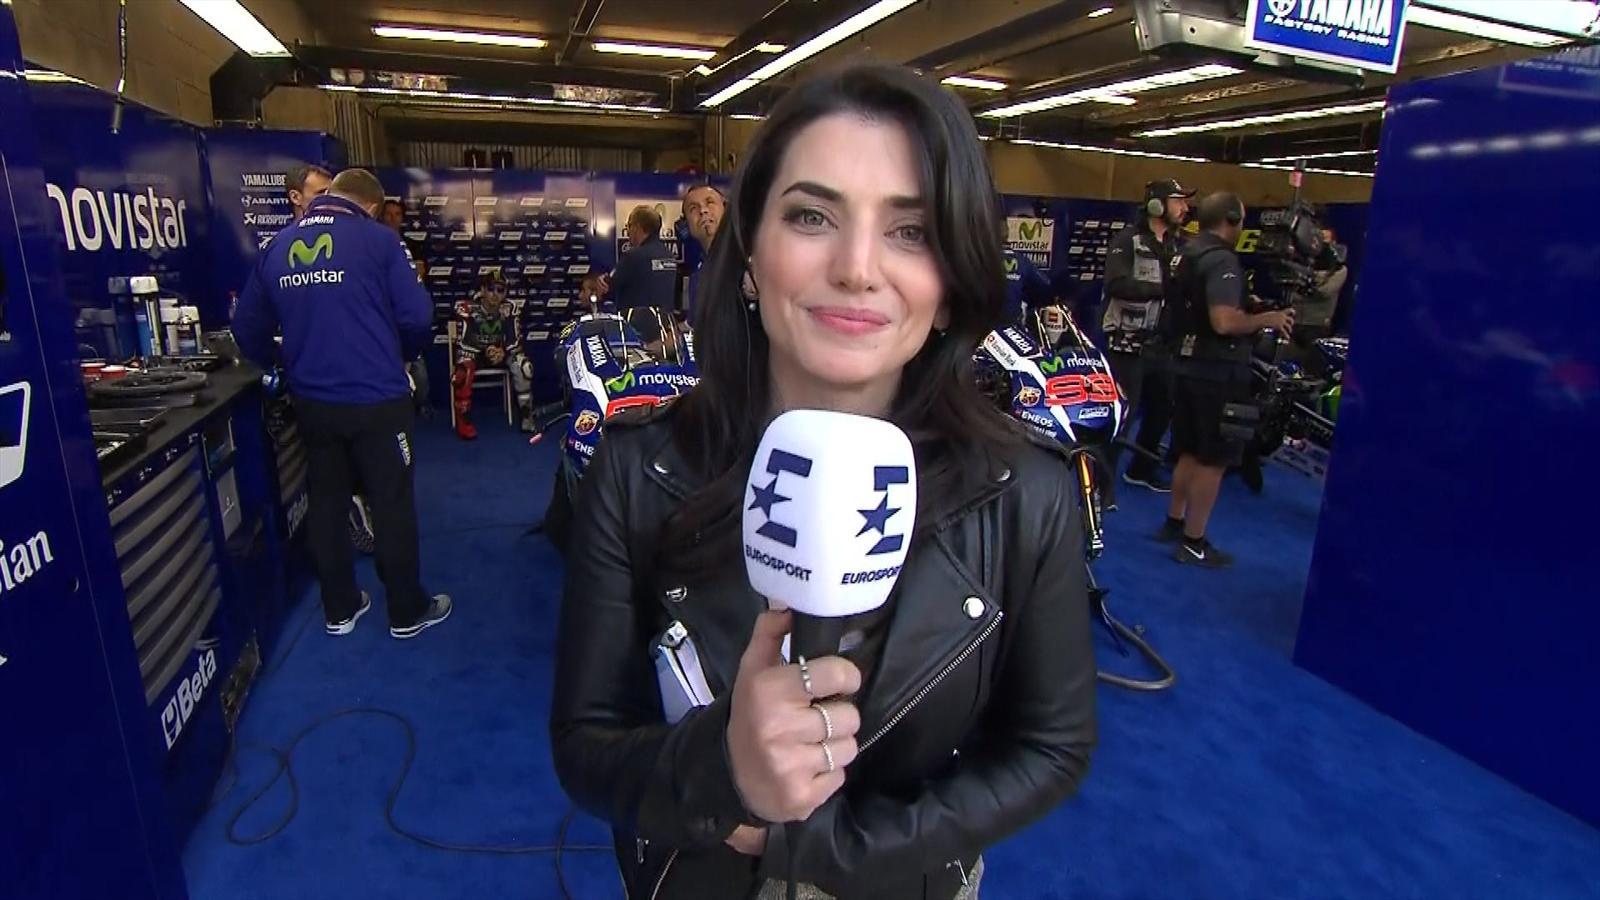 moto gp on eurosport